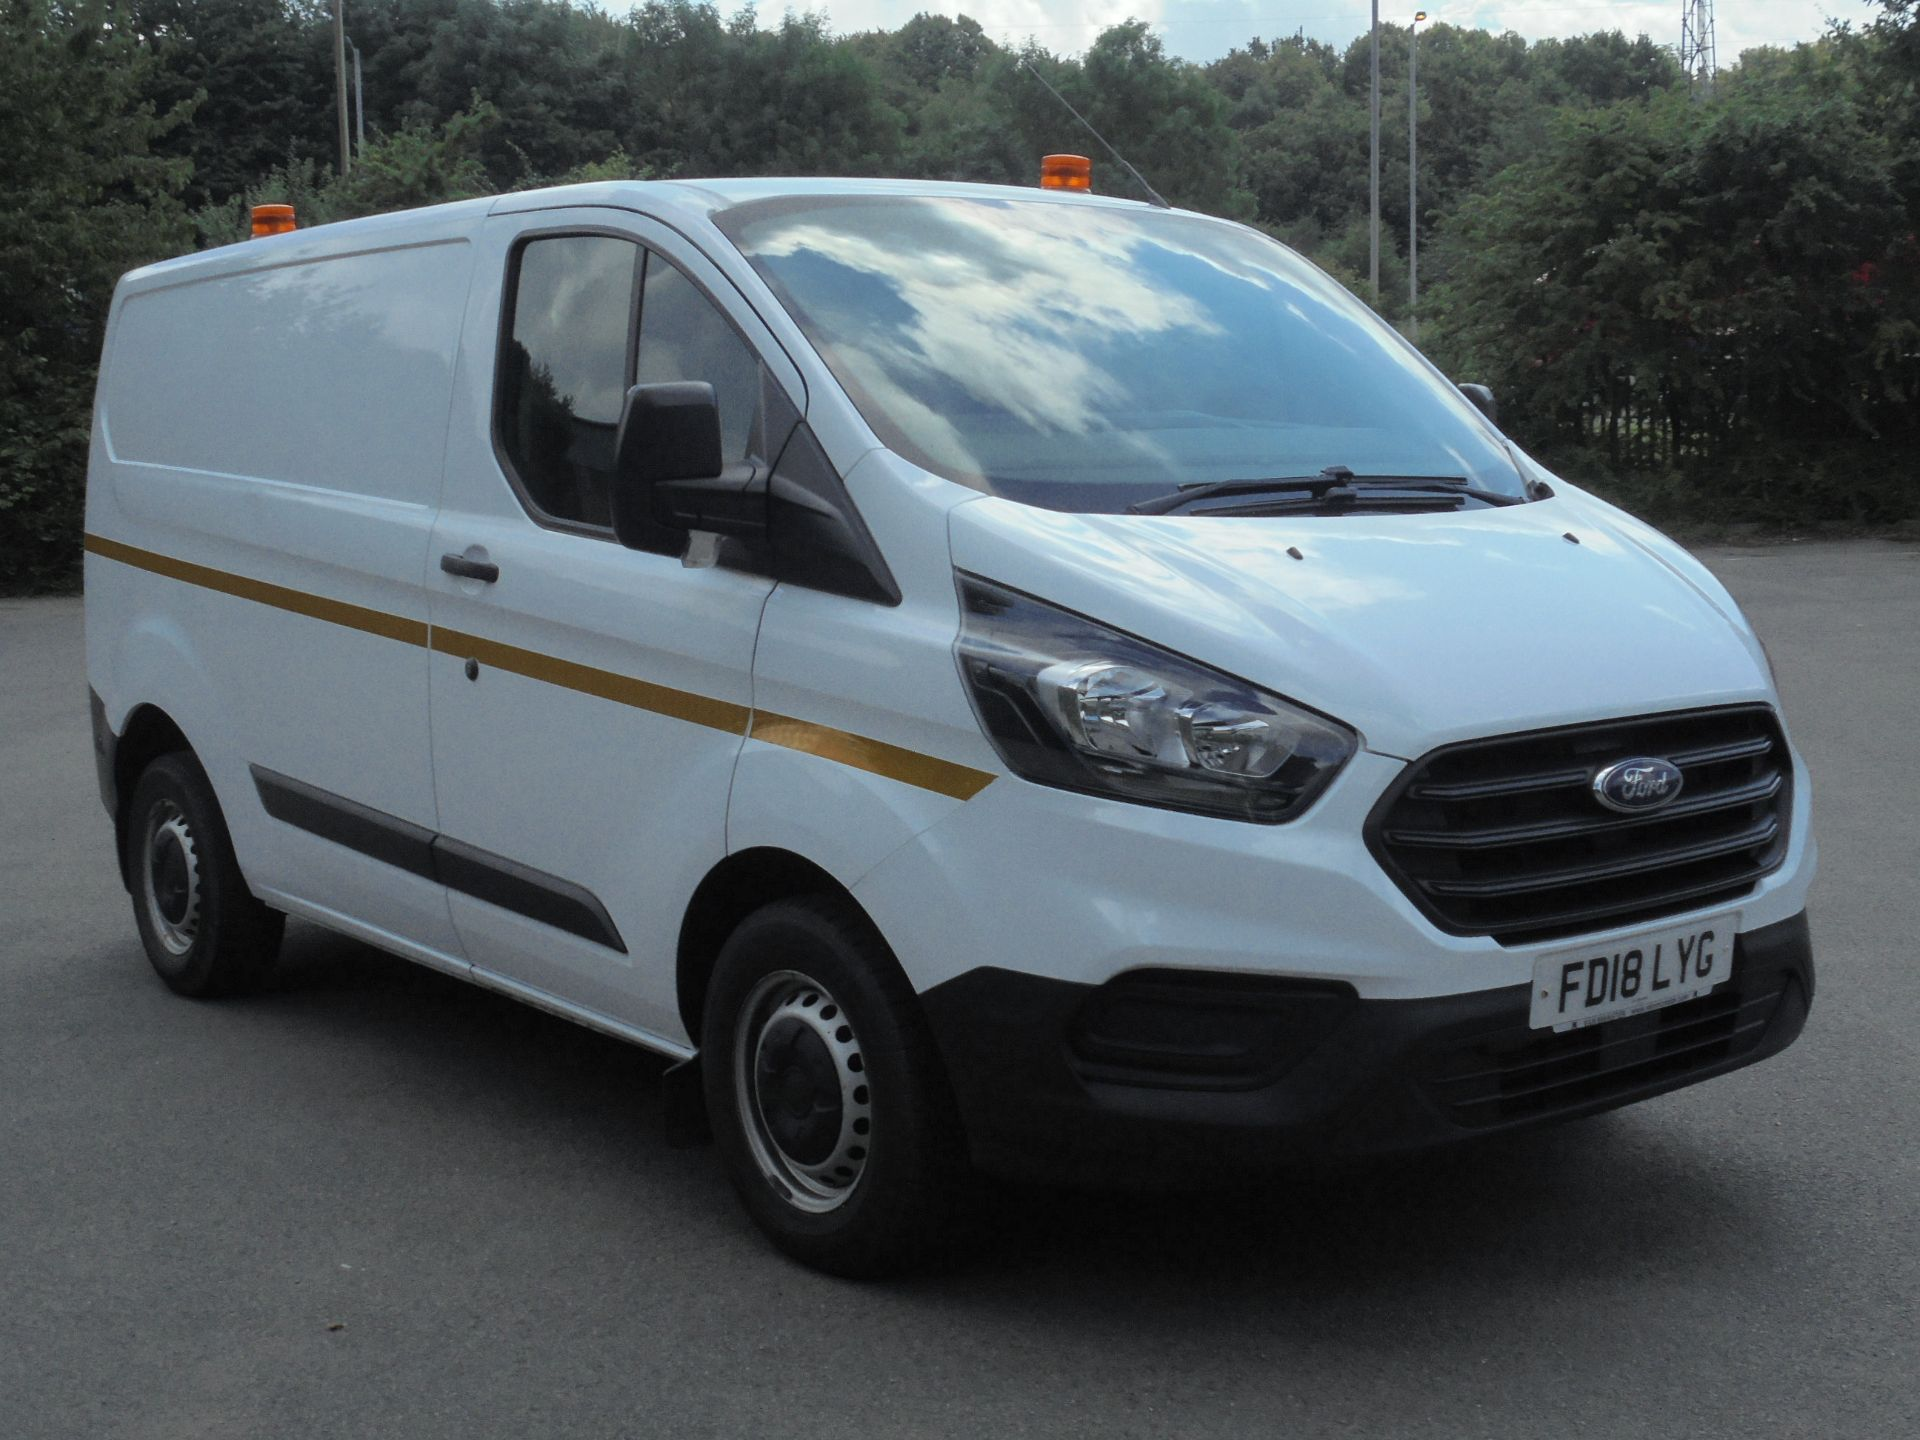 2018 Ford Transit Custom 2.0 Tdci 105Ps Low Roof Van (FD18LYG)